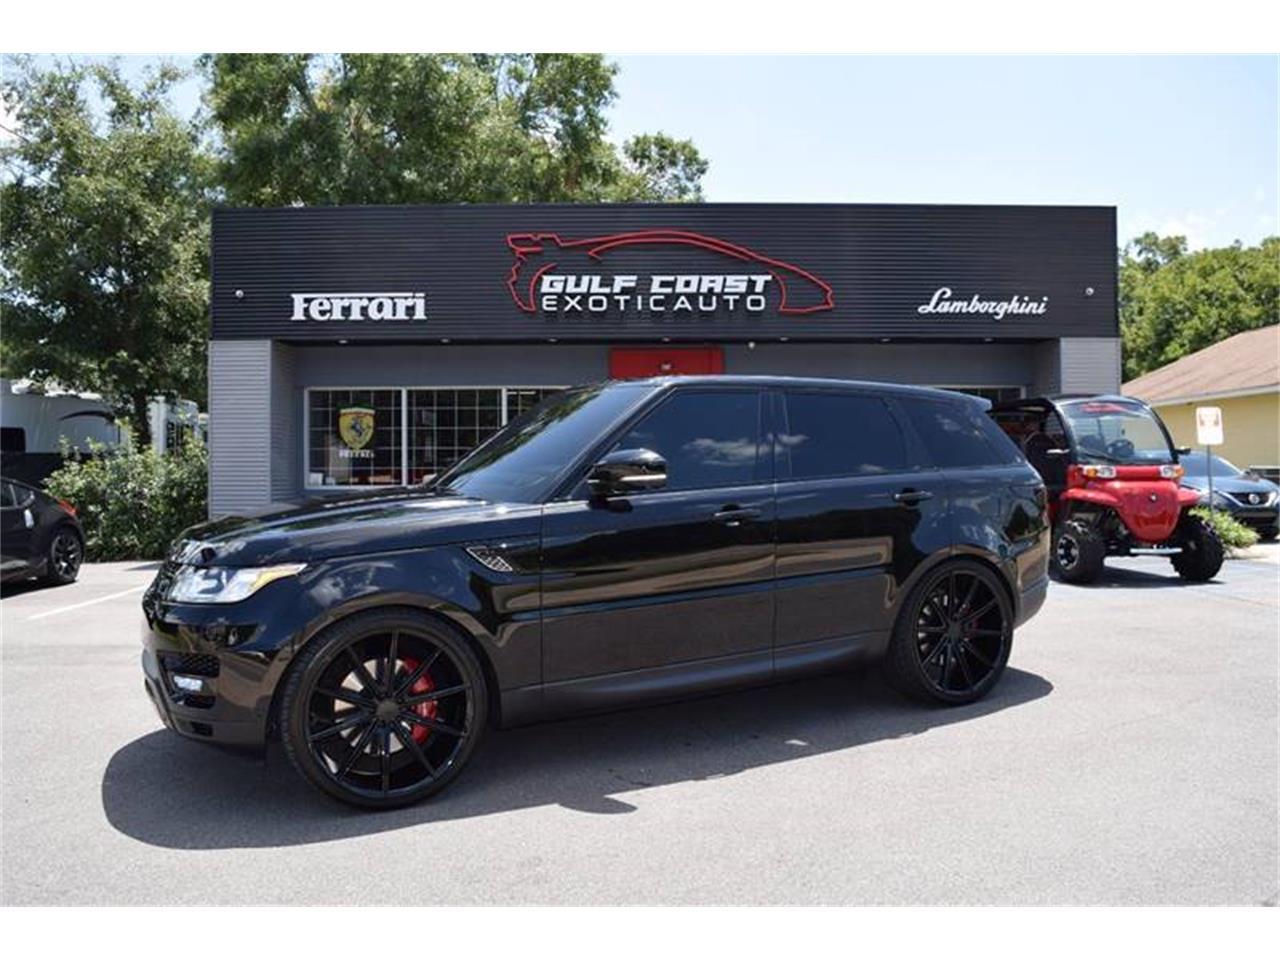 2014 Range Rover Sport For Sale >> For Sale 2014 Land Rover Range Rover Sport In Biloxi Mississippi